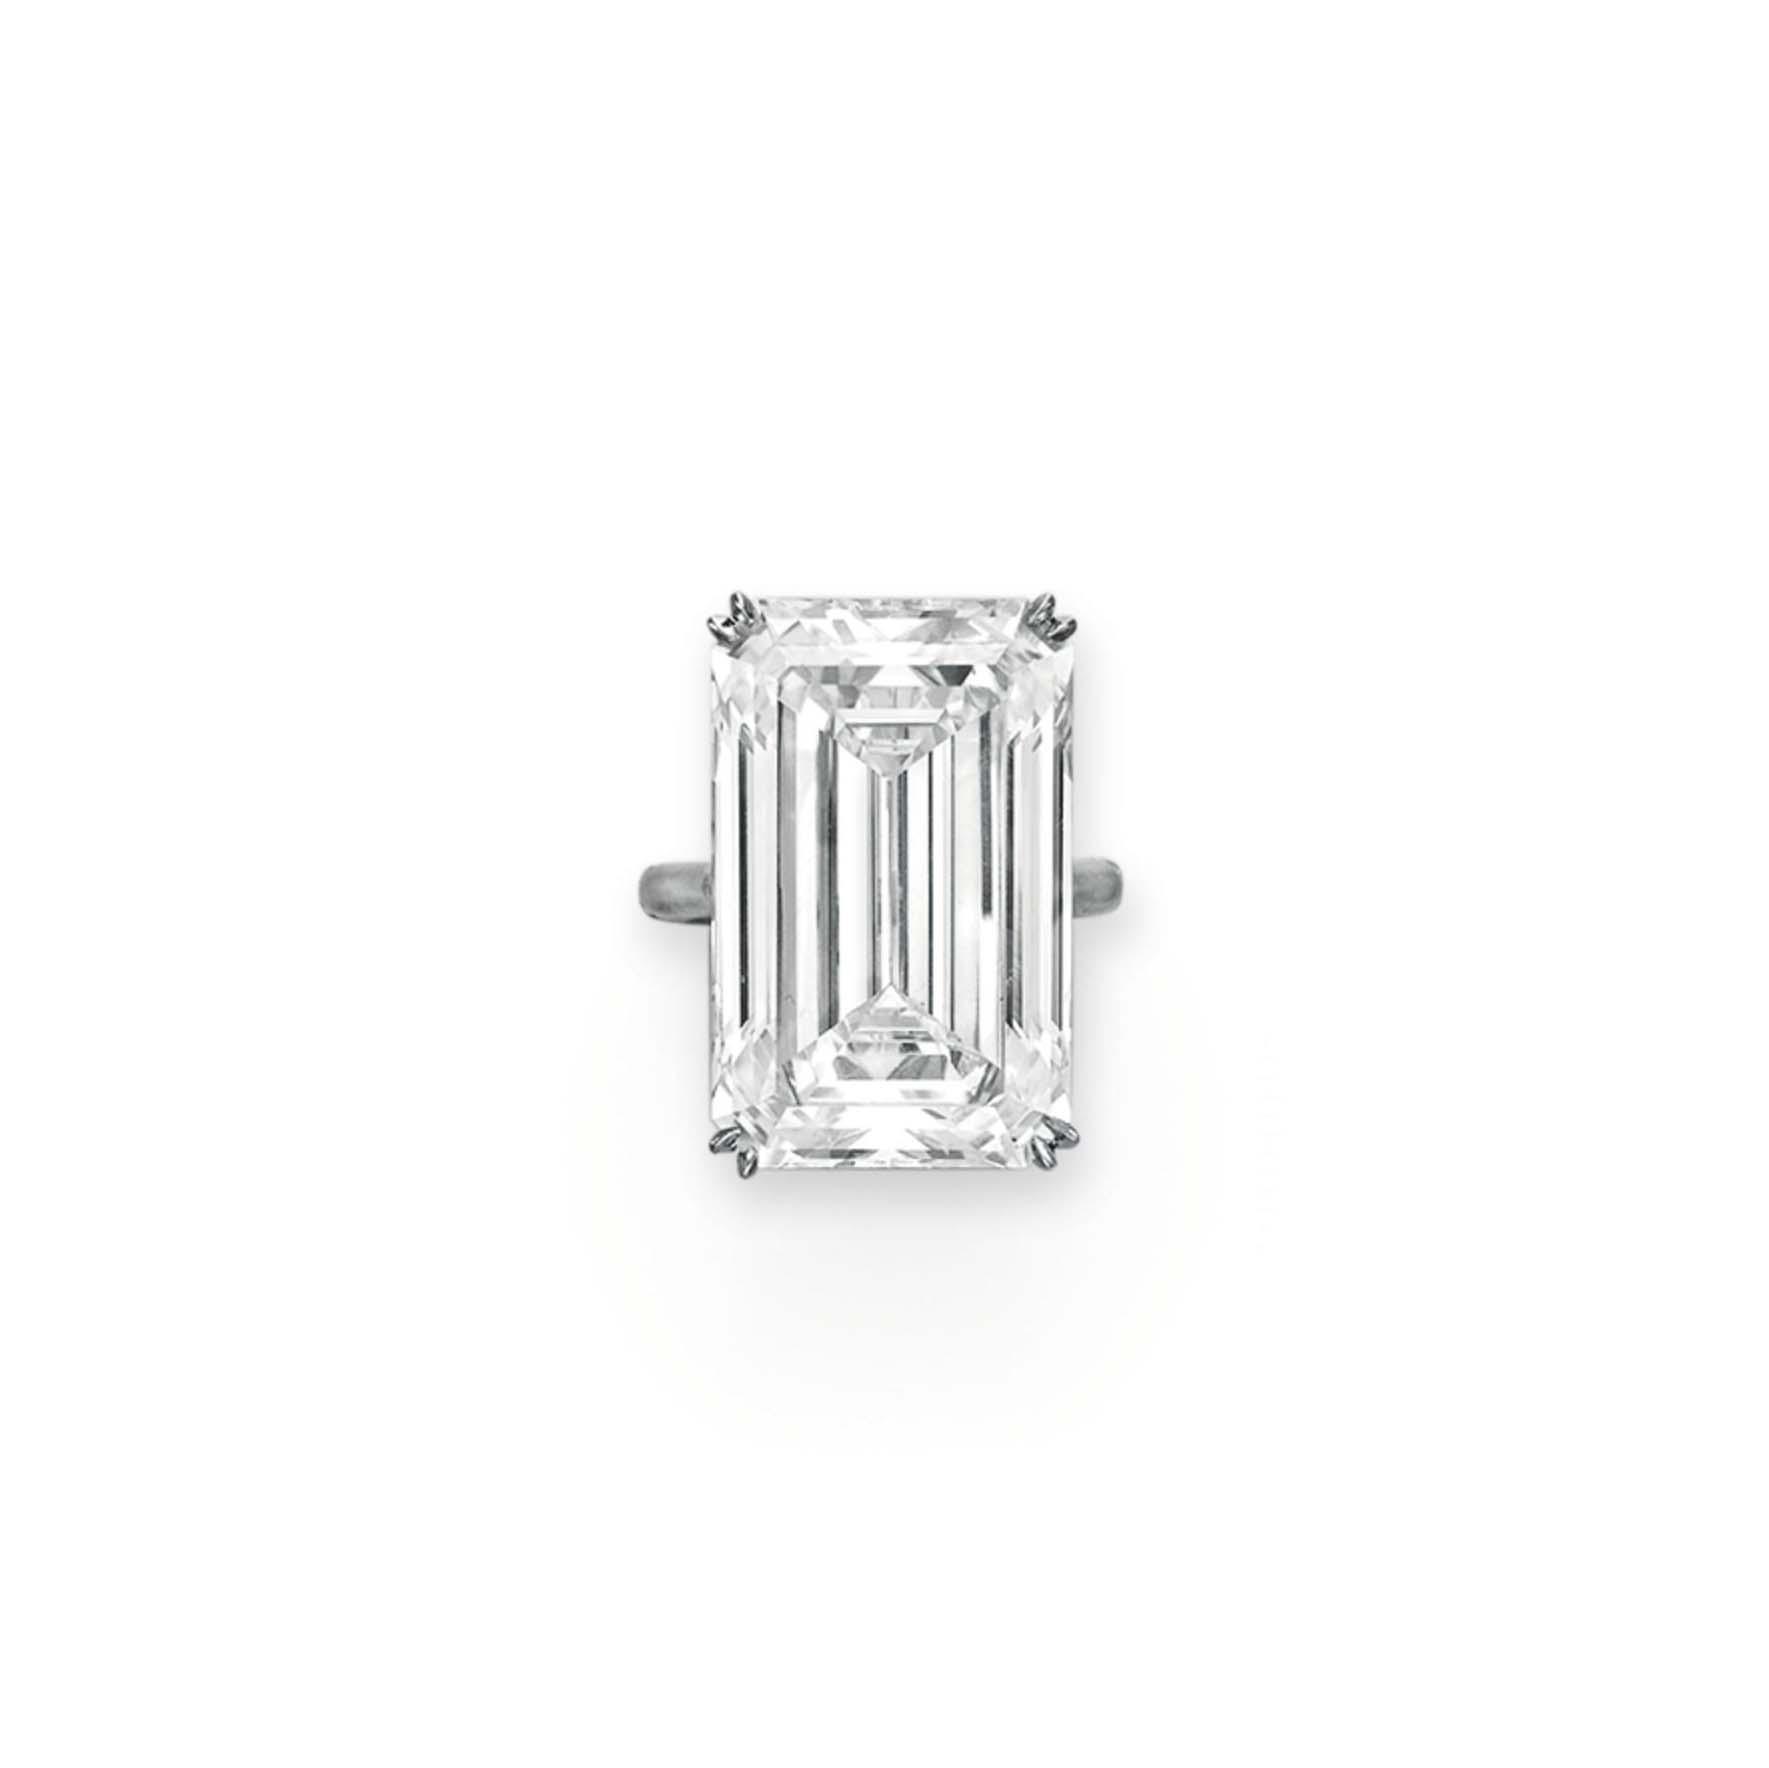 AN IMPRESSIVE DIAMOND RING